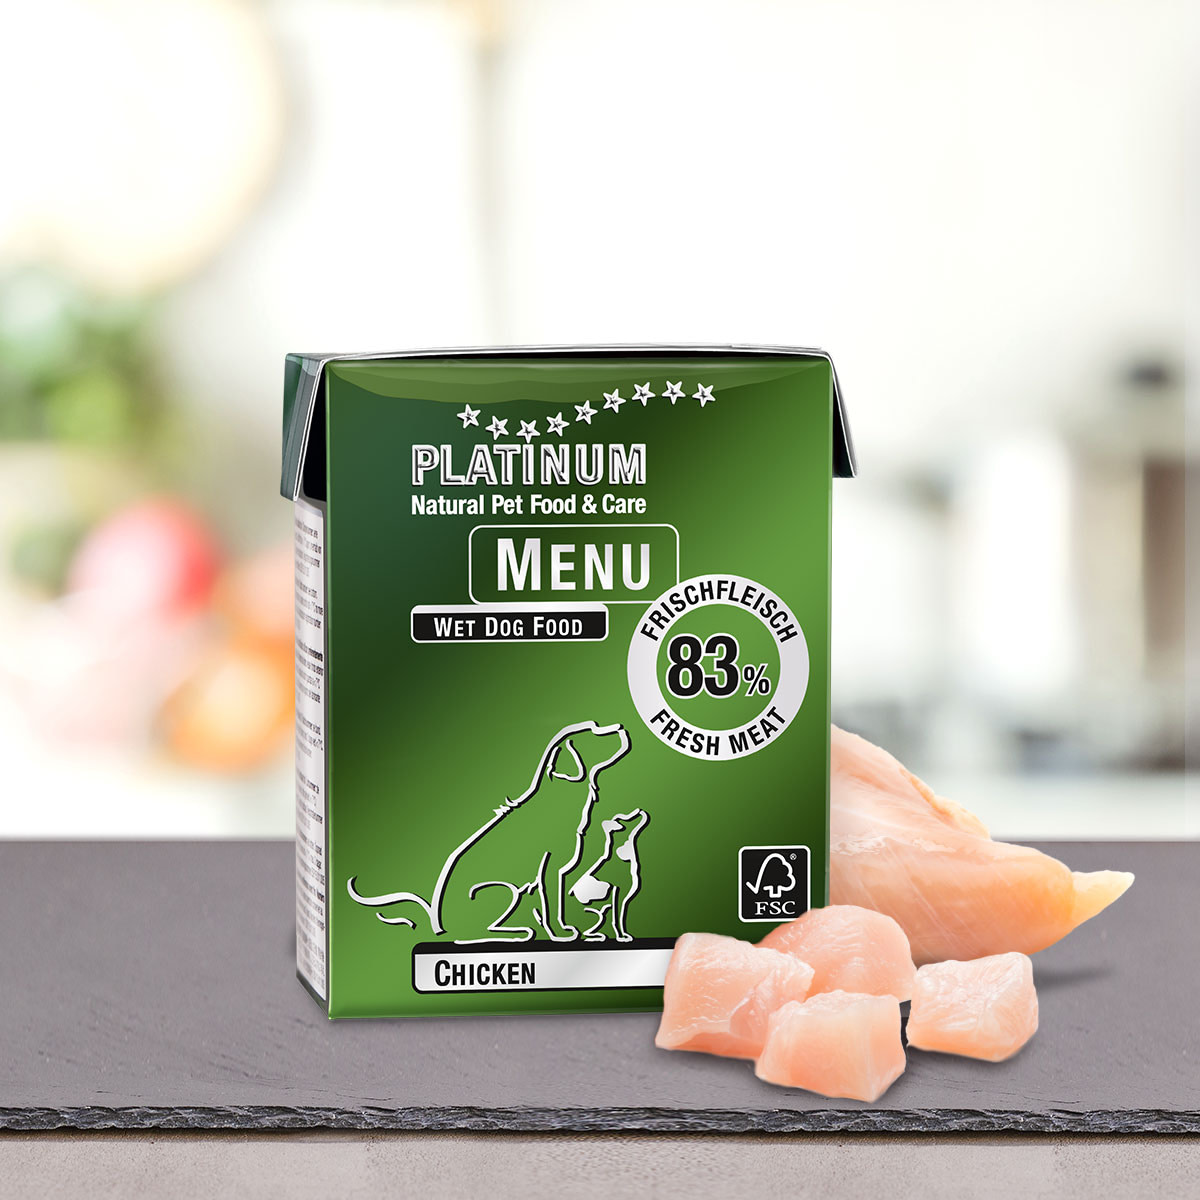 img1200 einzel menu chicken 1 Pepper Paws Pepper Paws